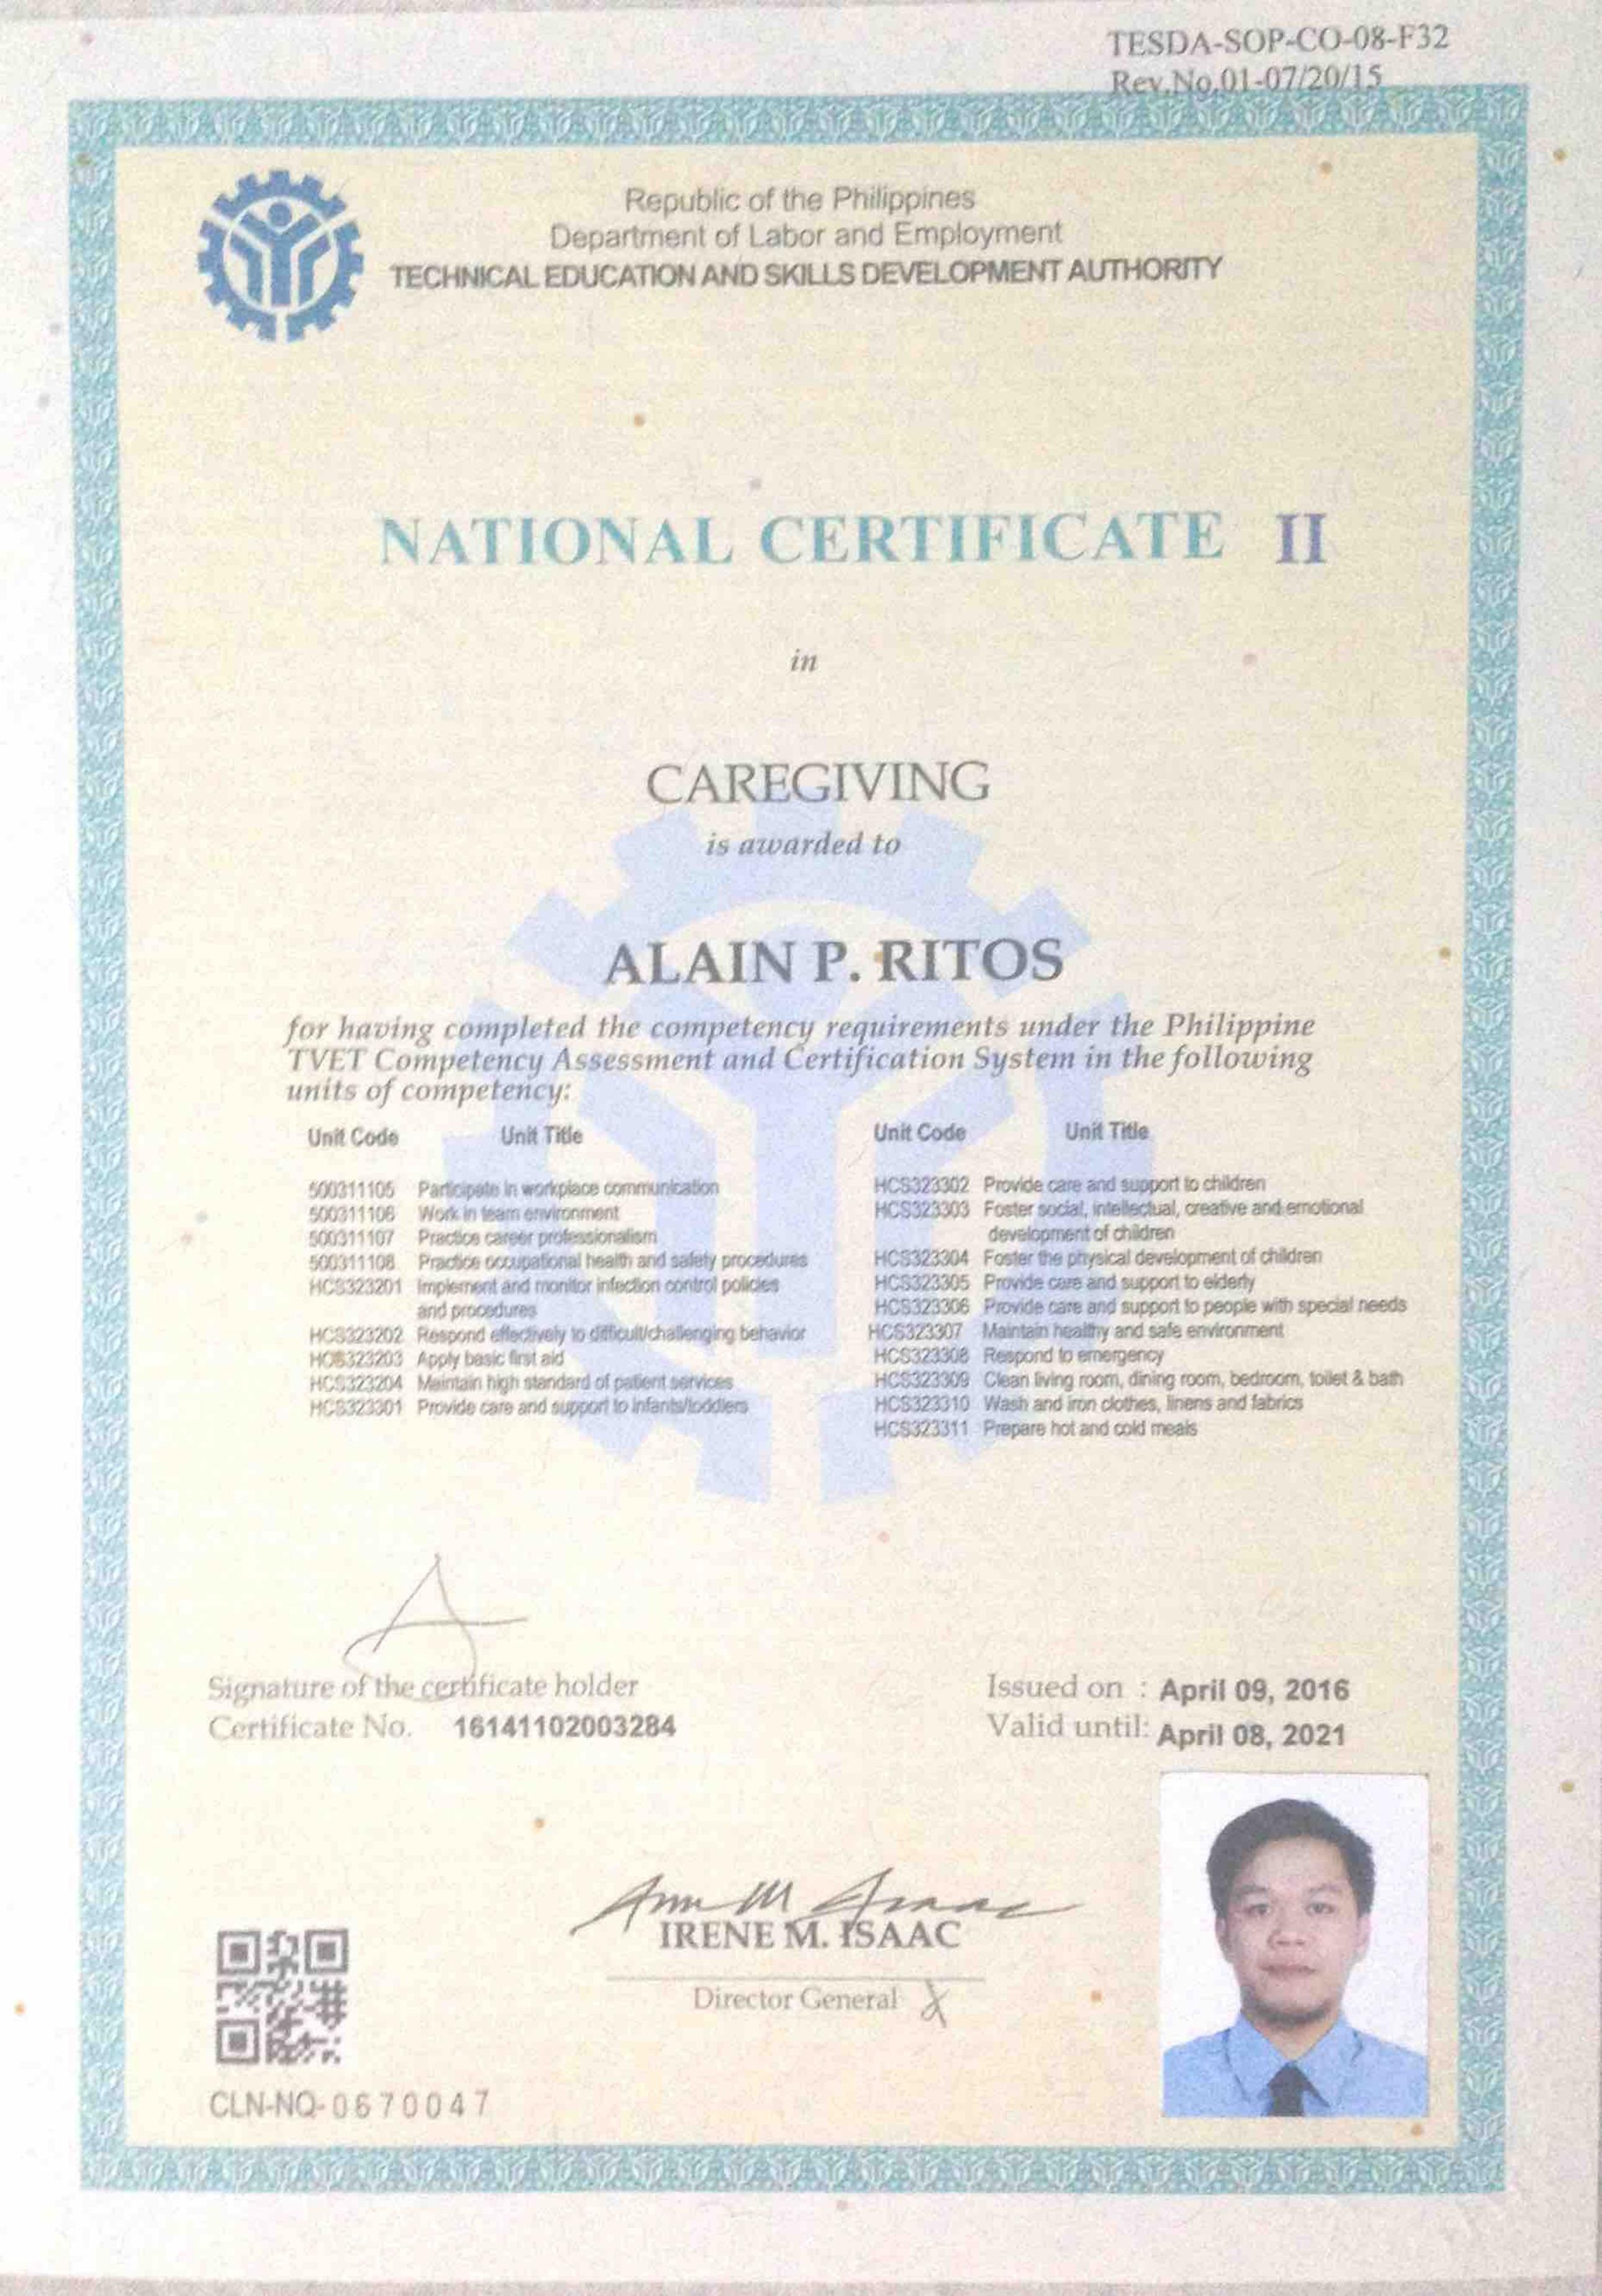 Alain ritos bayt caregiving ncii certificate 1betcityfo Choice Image